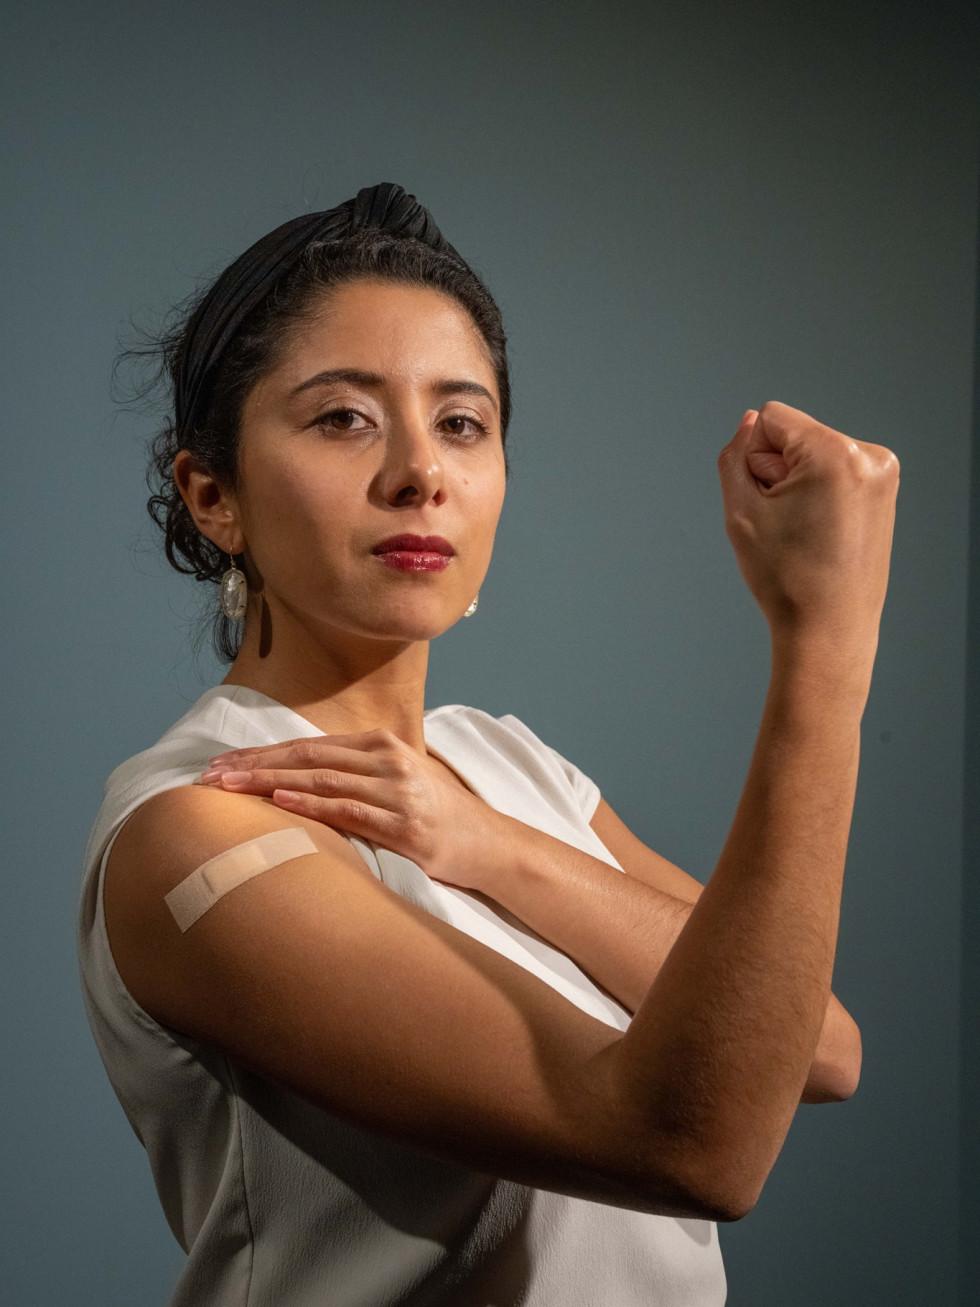 Lina Hidalgo vaccination